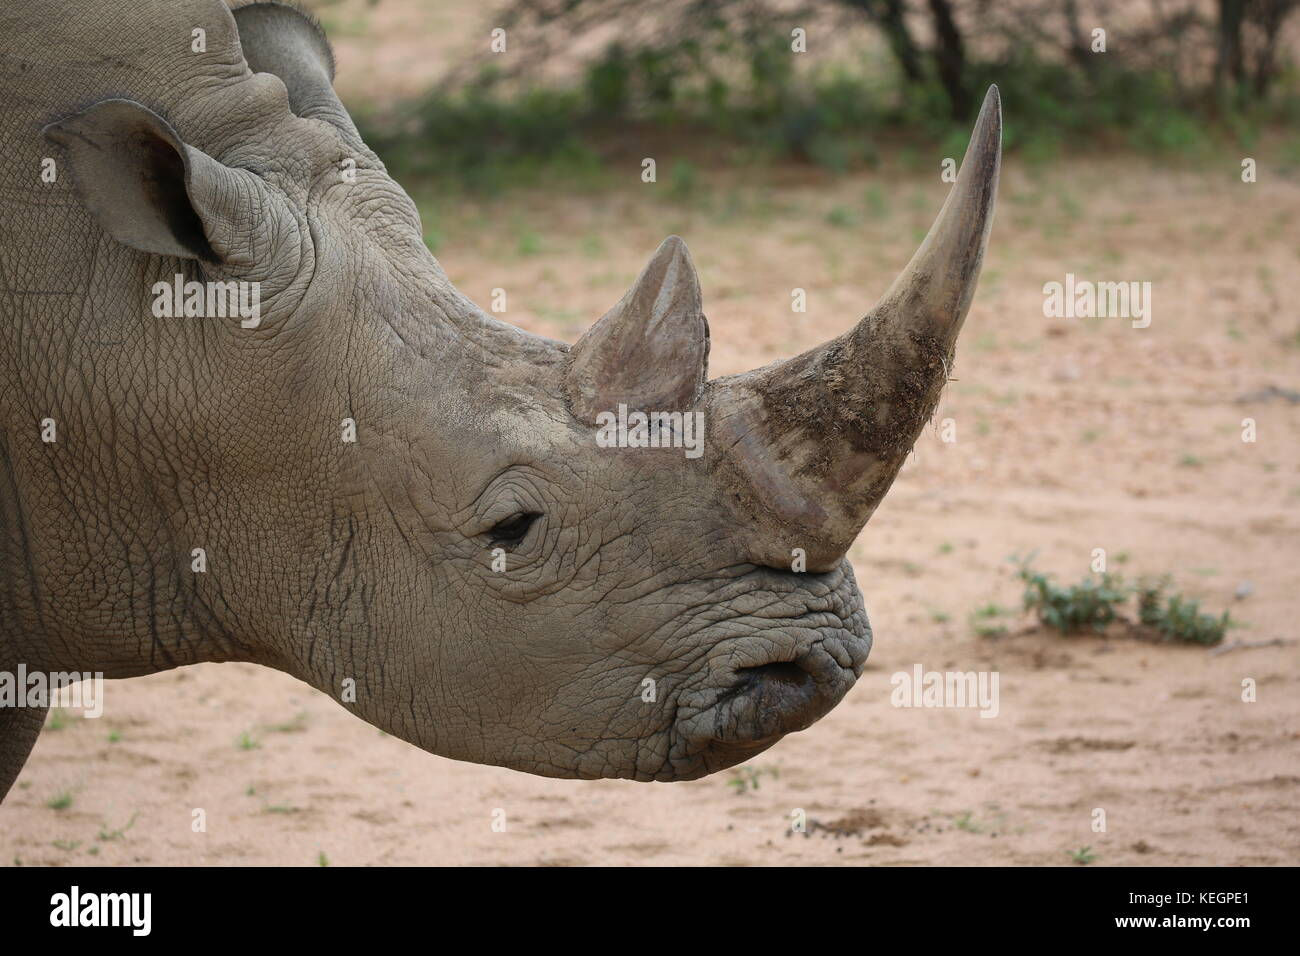 Breitmaulnashorn in Namibia - Stock Image